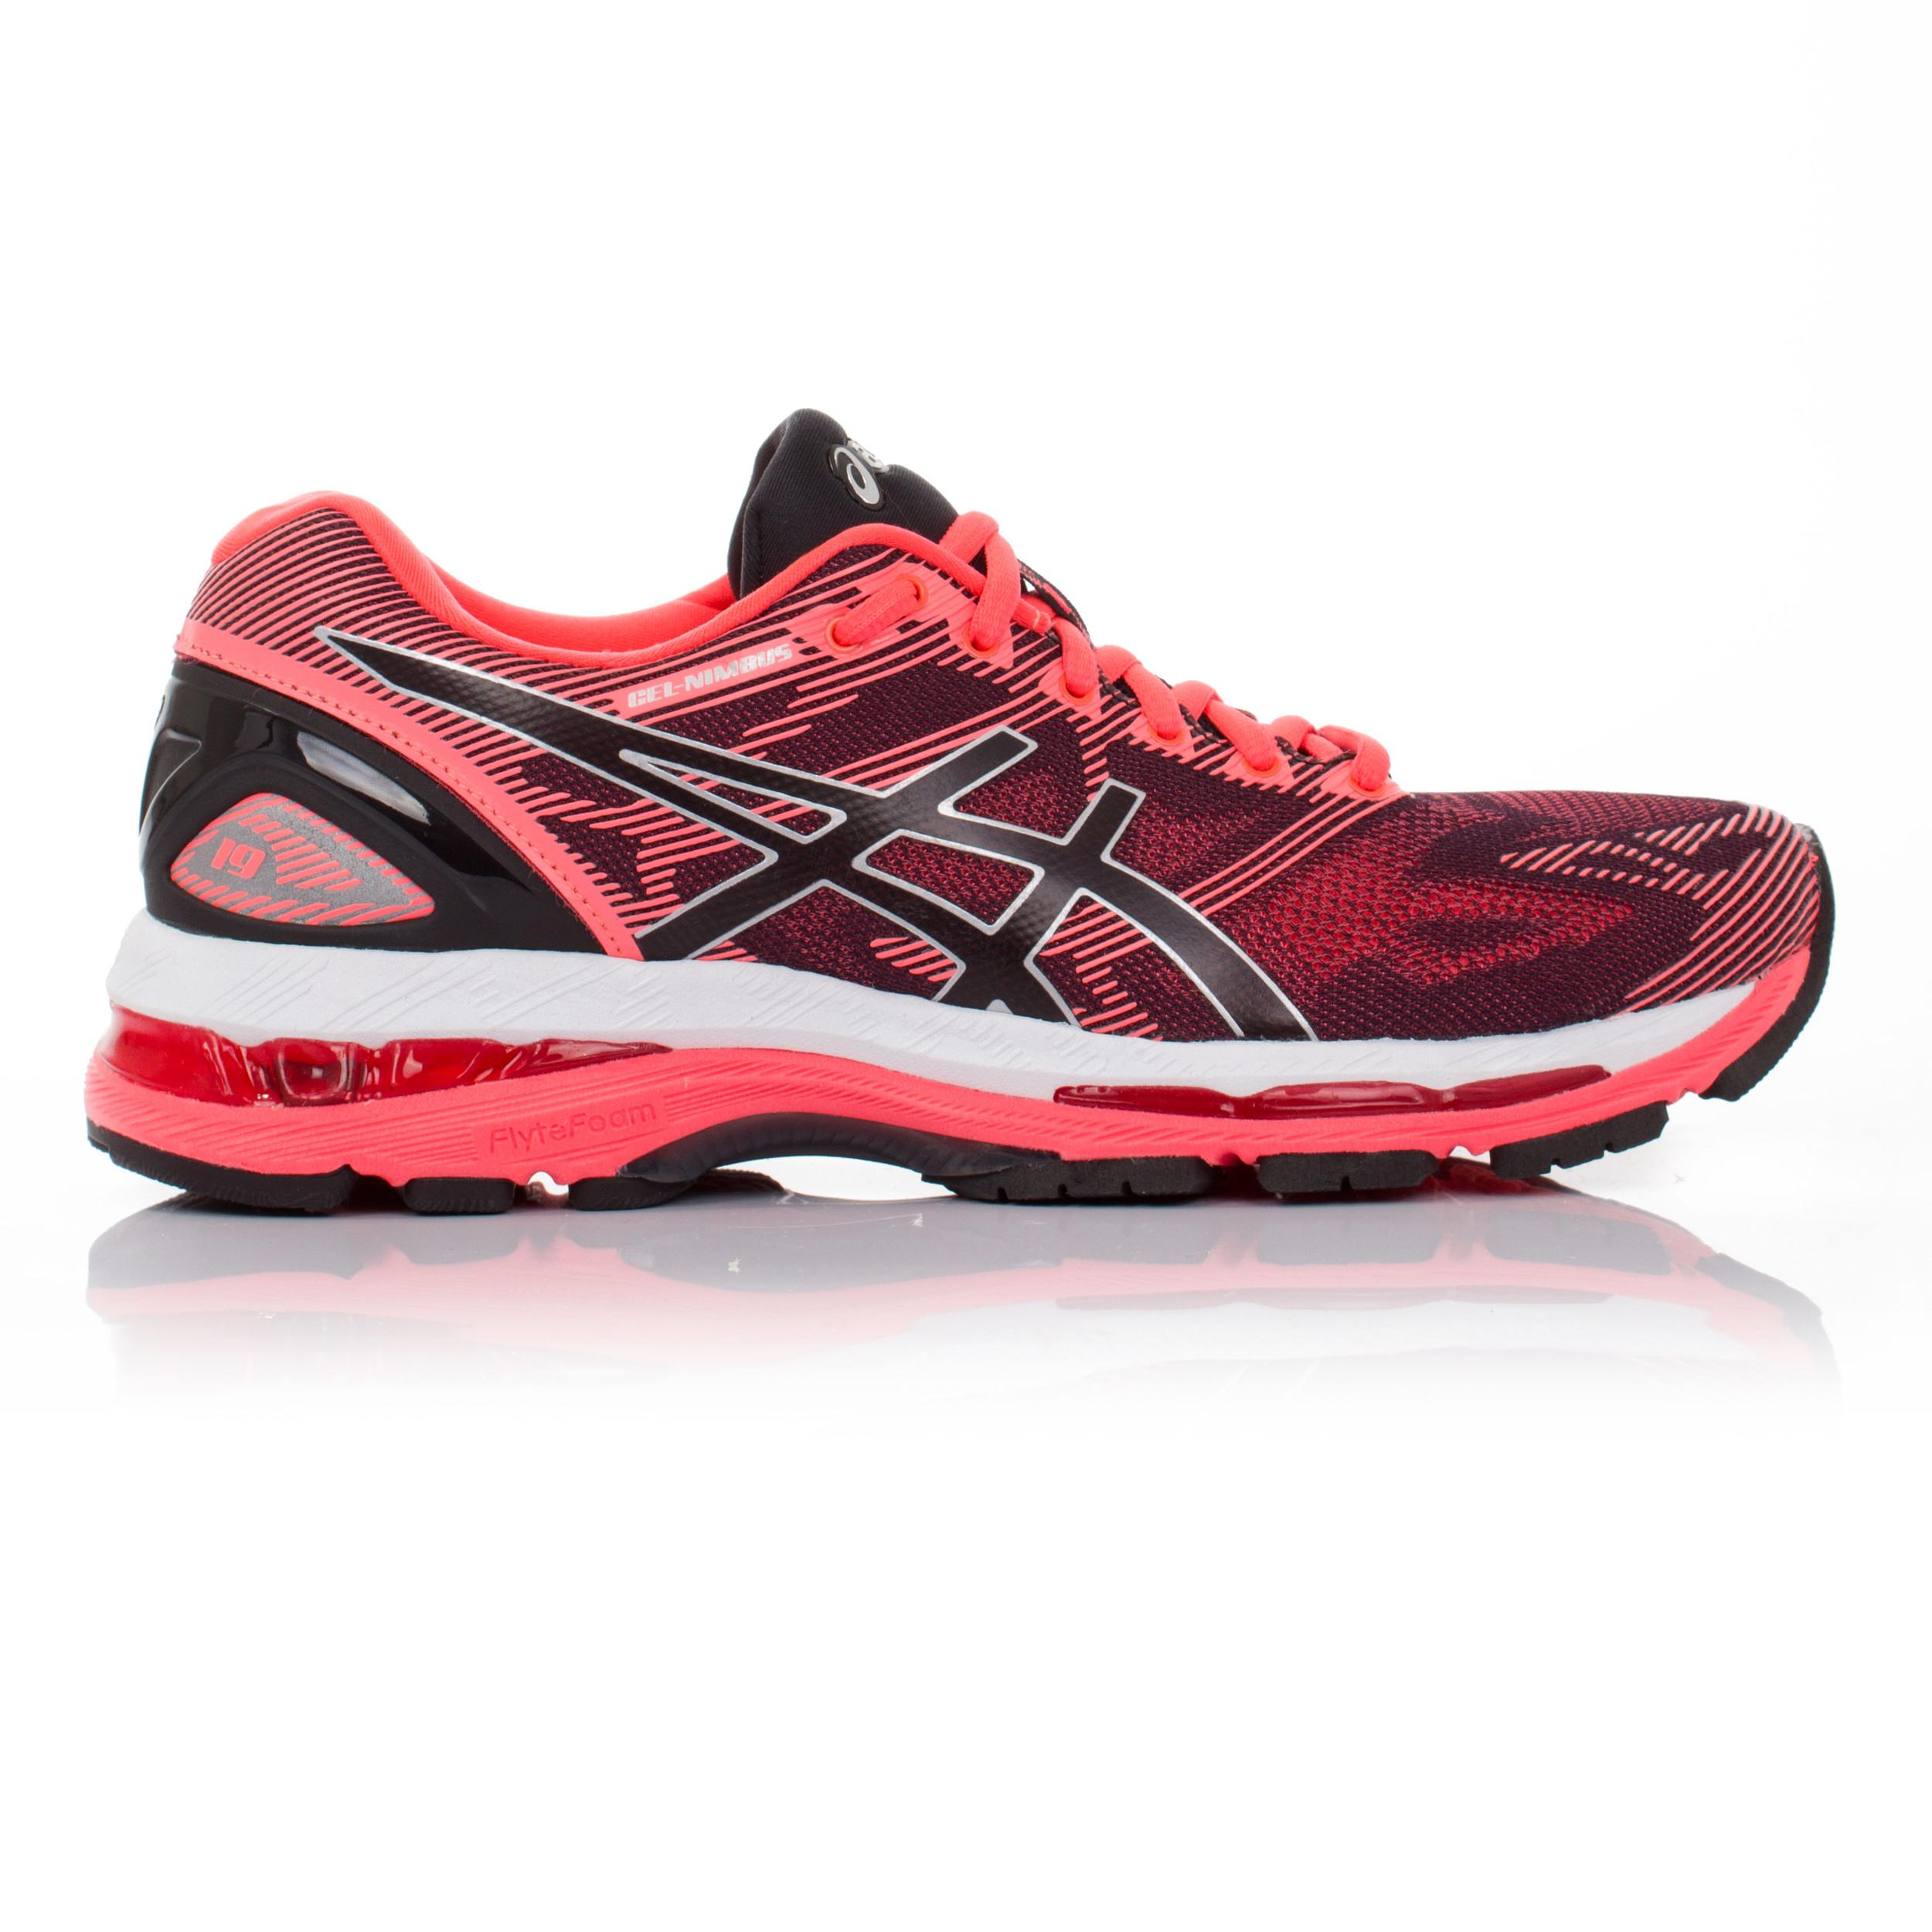 promo code 01abd 01e0e Asics Gel Nimbus 19 Womens Pink Cushioned Running Road Shoes Trainers